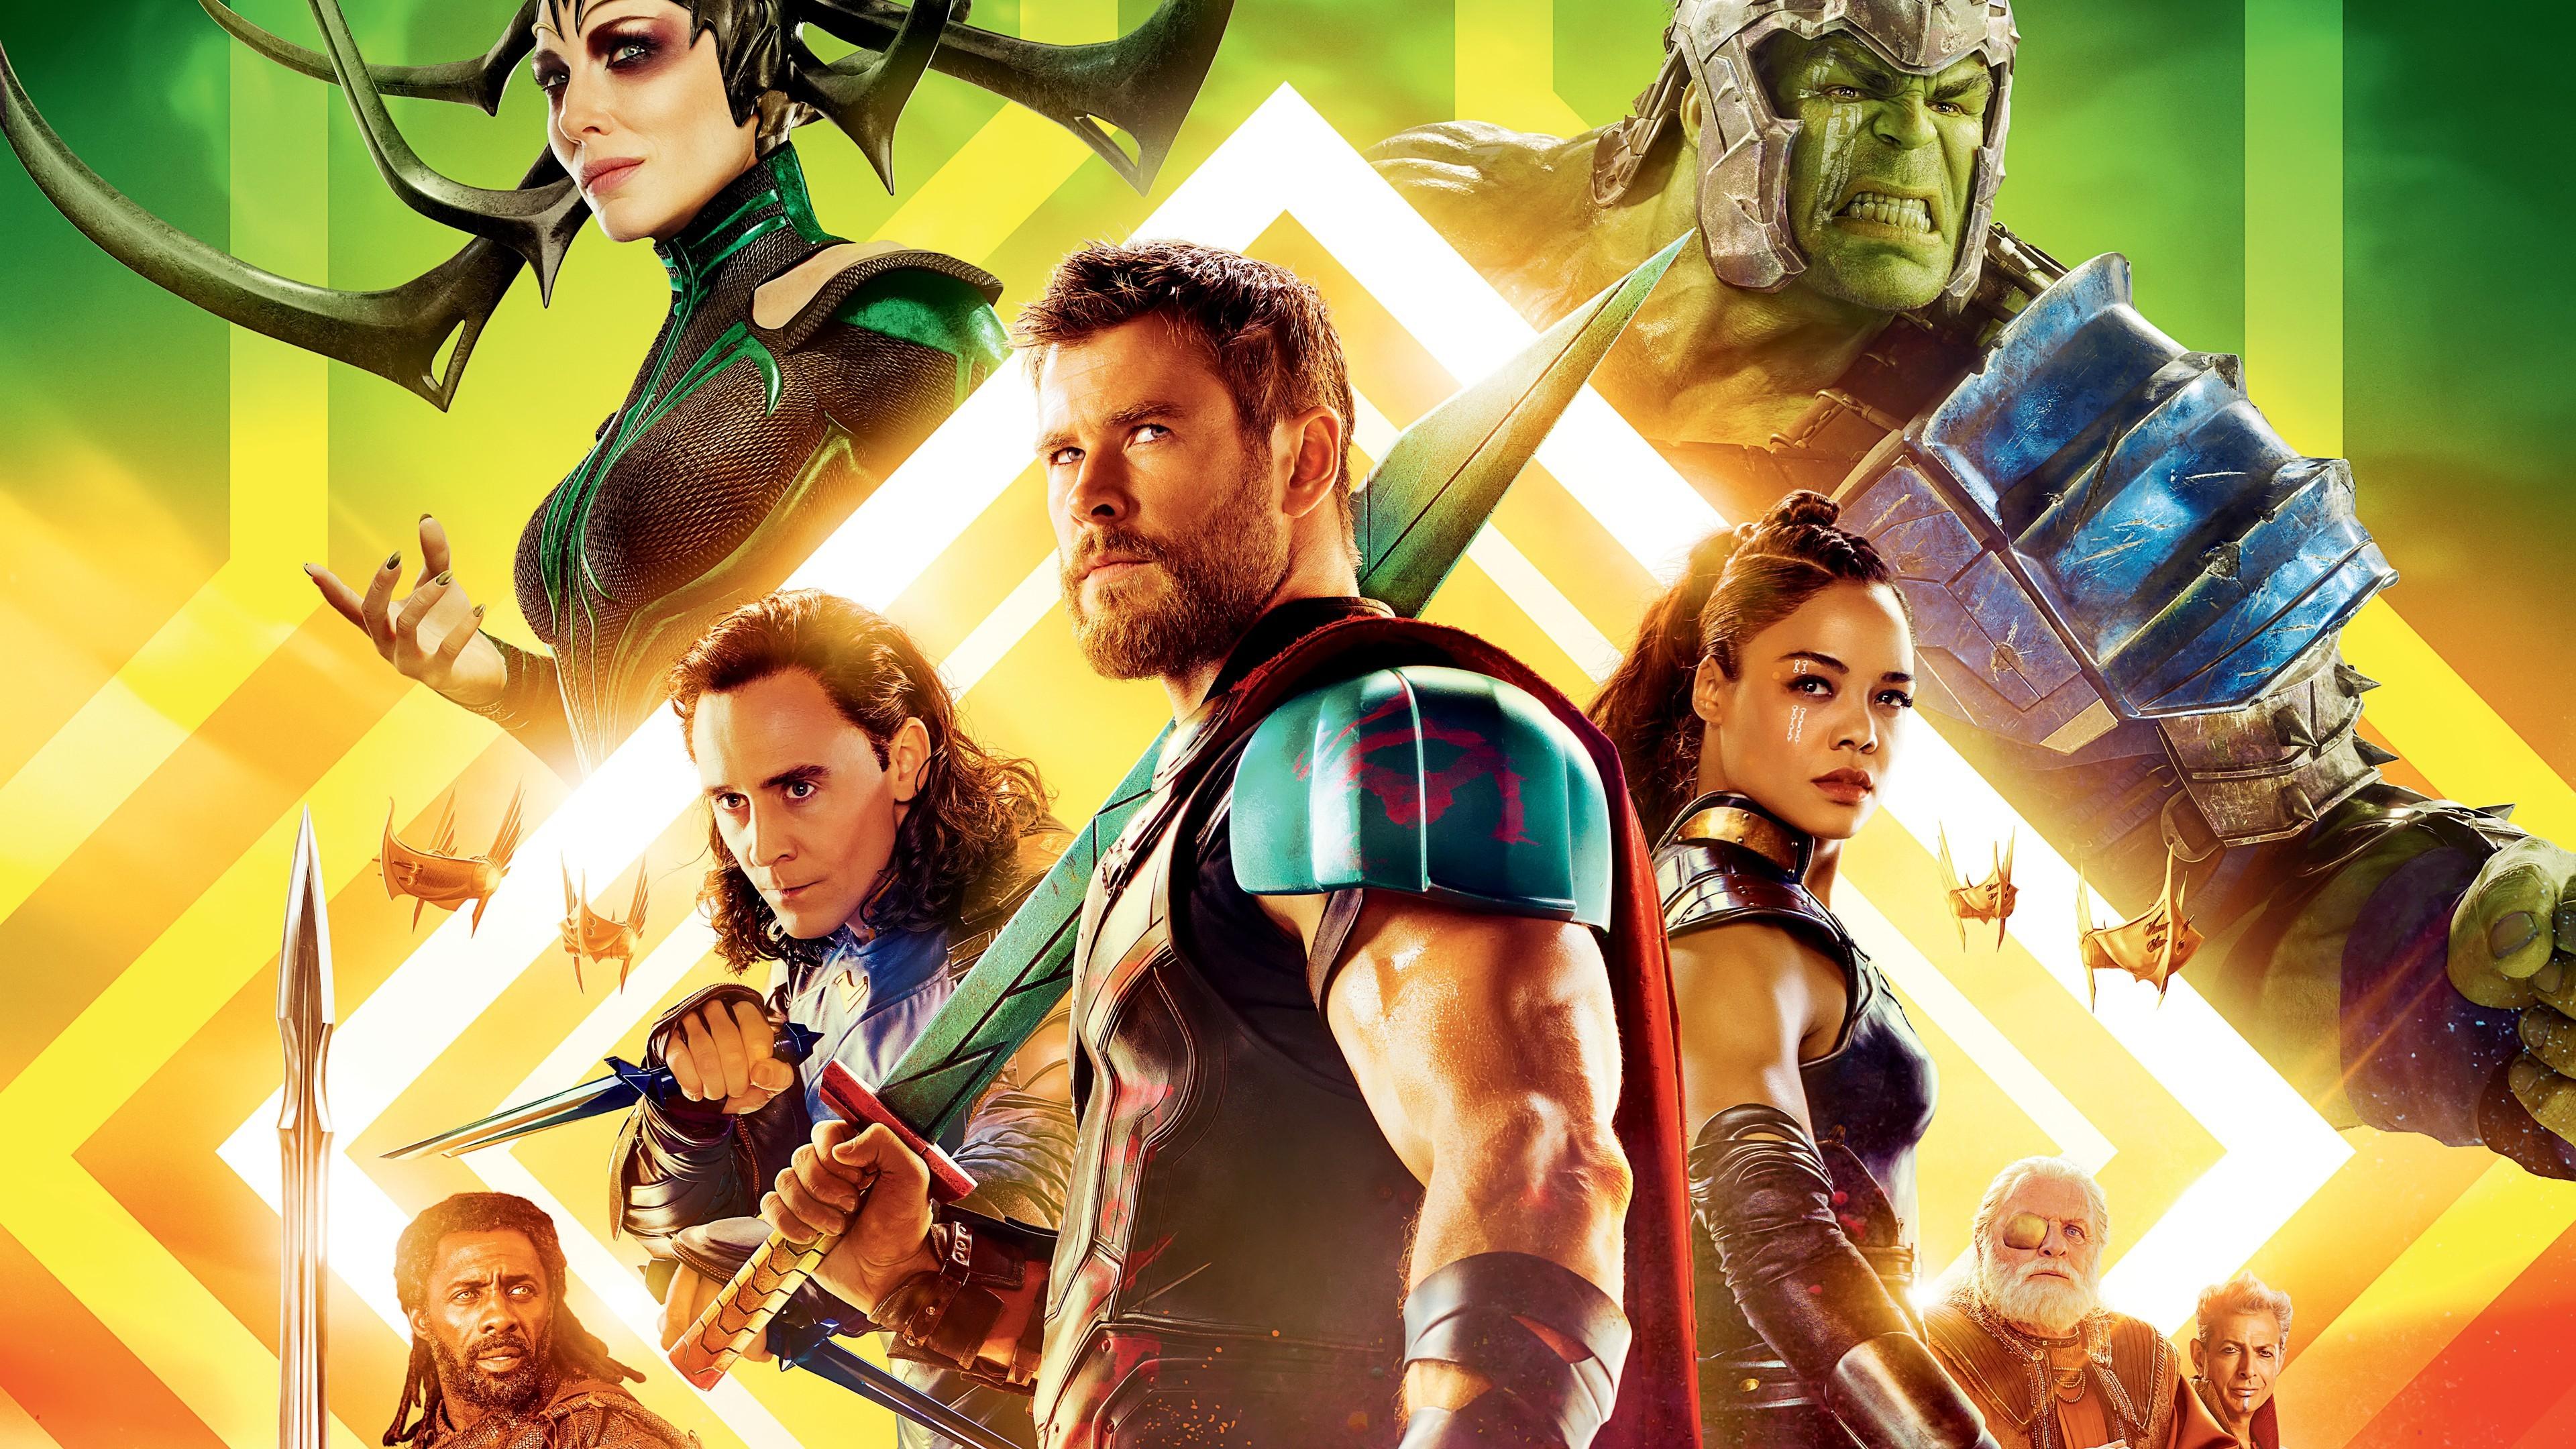 Res: 3840x2160, Movies / Thor Ragnarok Wallpaper